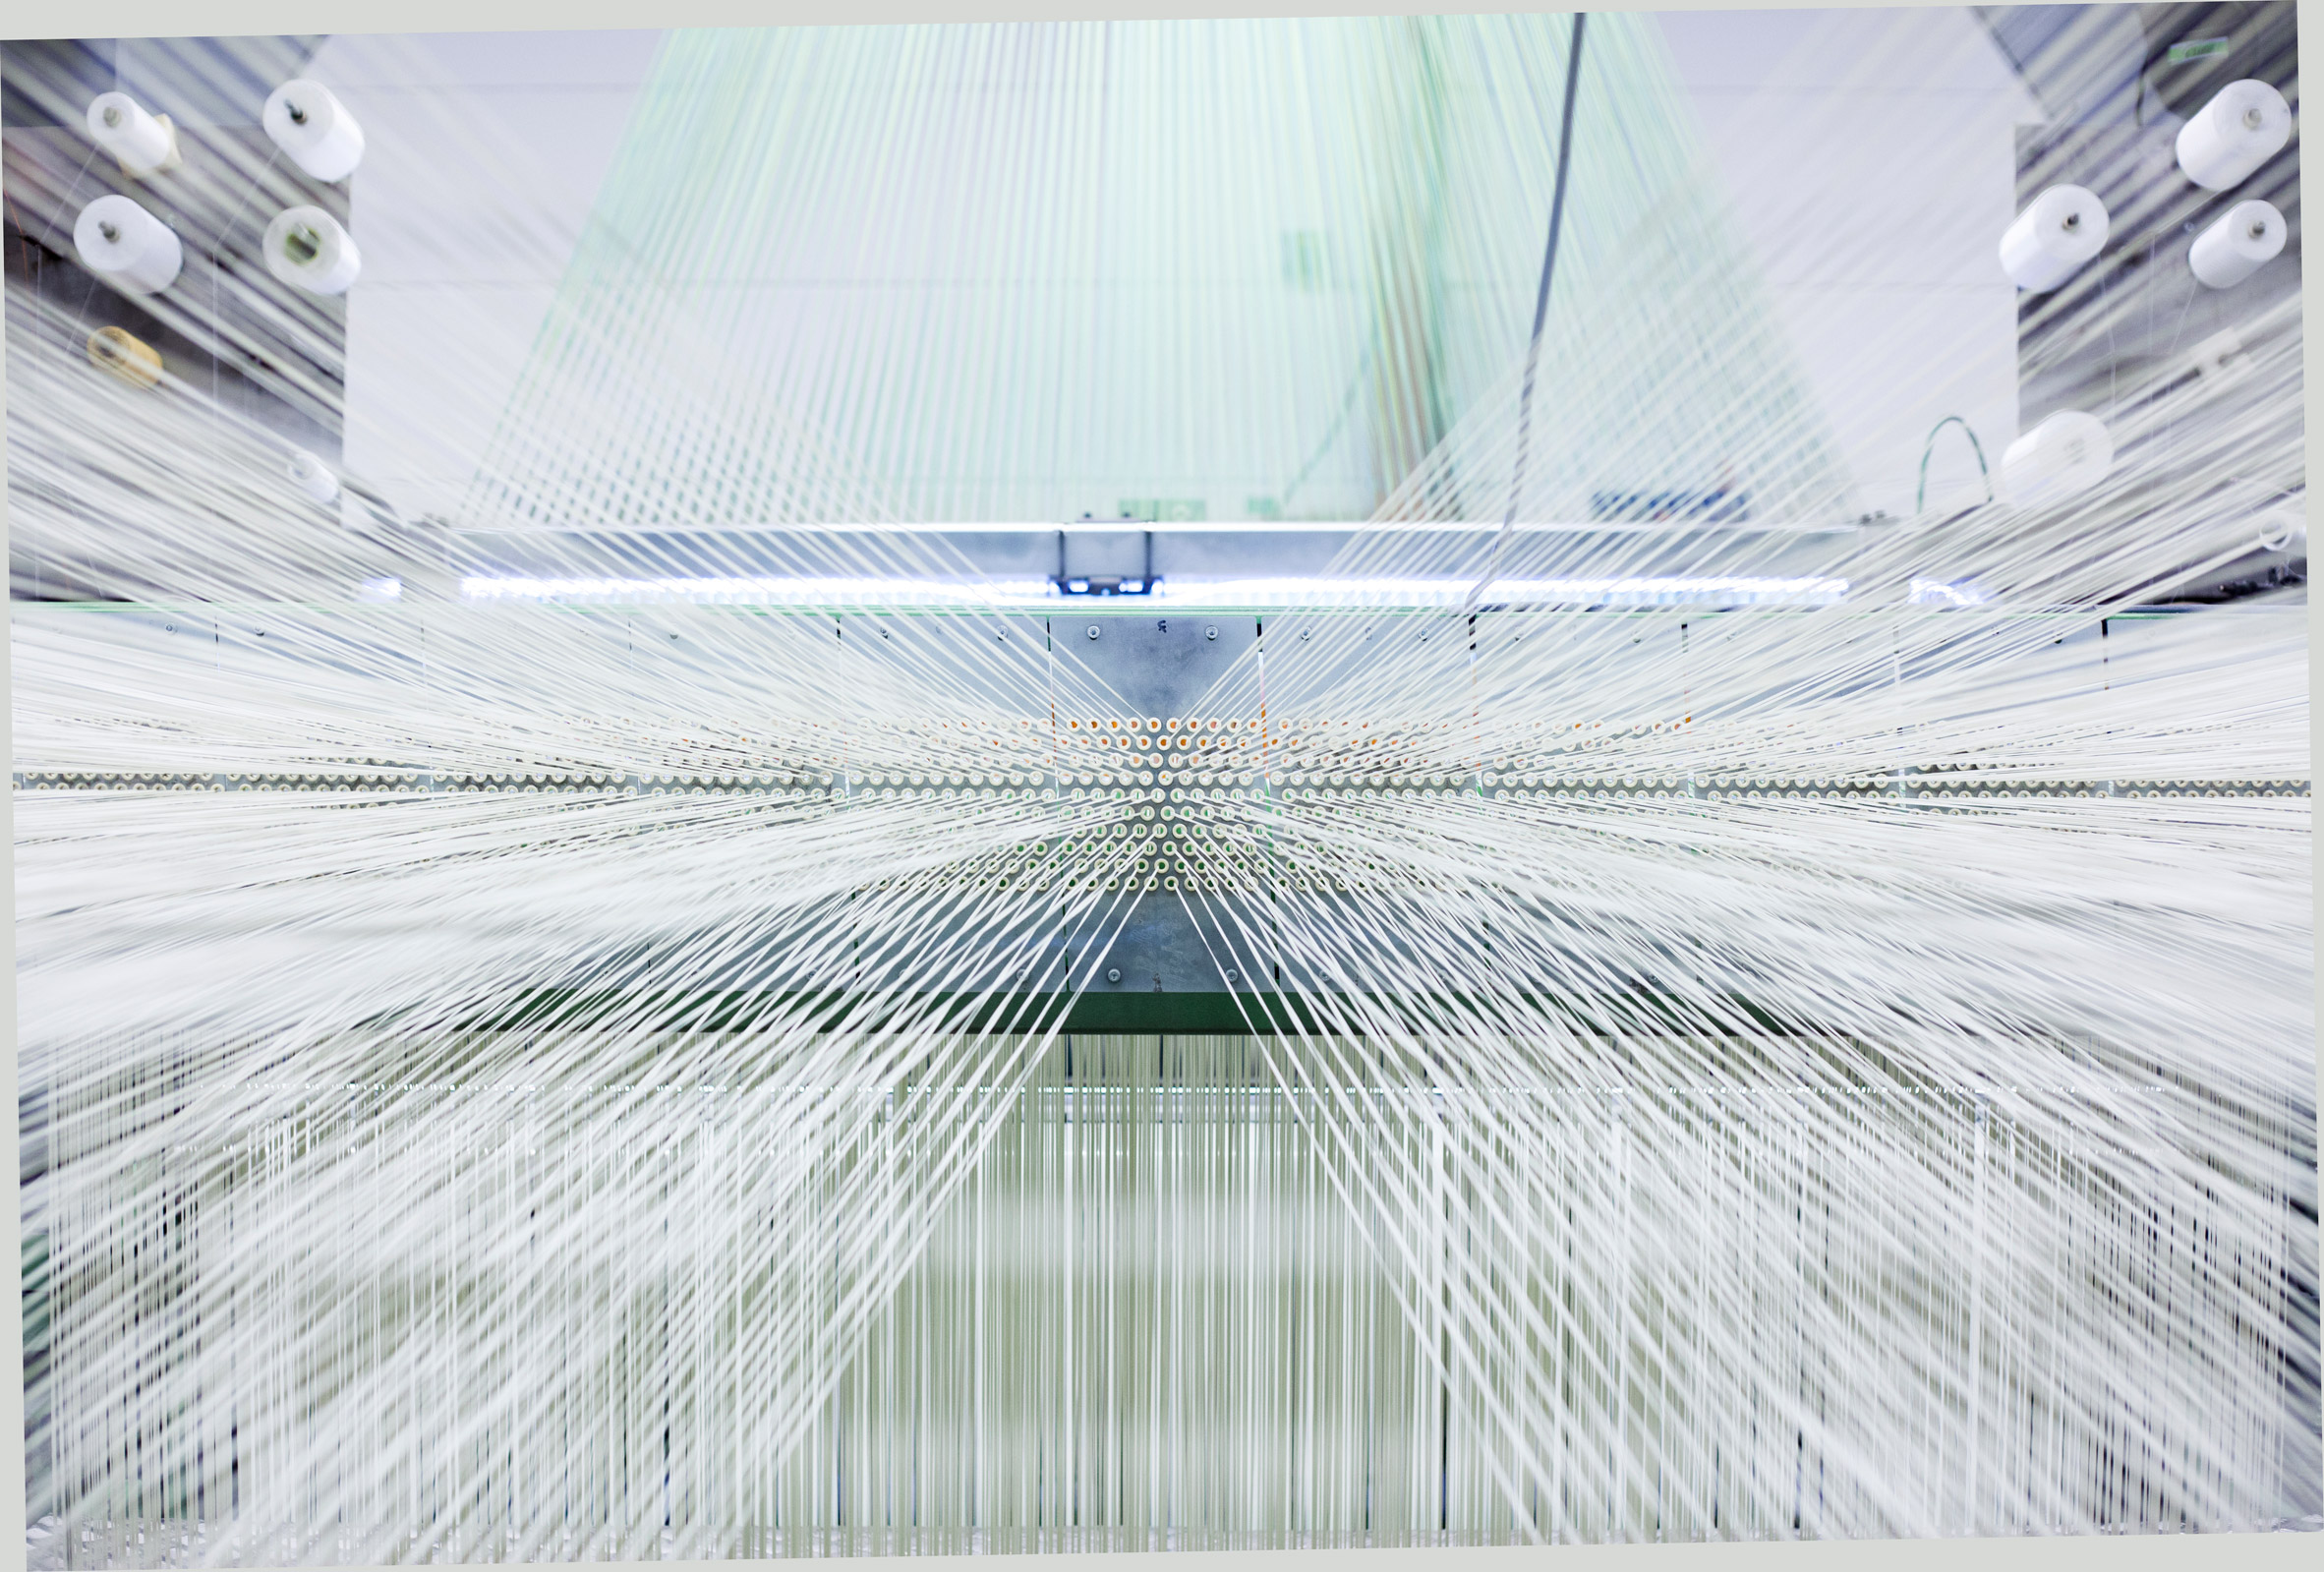 video-bolon-at-heart-michaela-ljungdahl-recycling-vinyl-flooring-pvc-design-sweden-movie_dezeen_2364_col_2.jpg